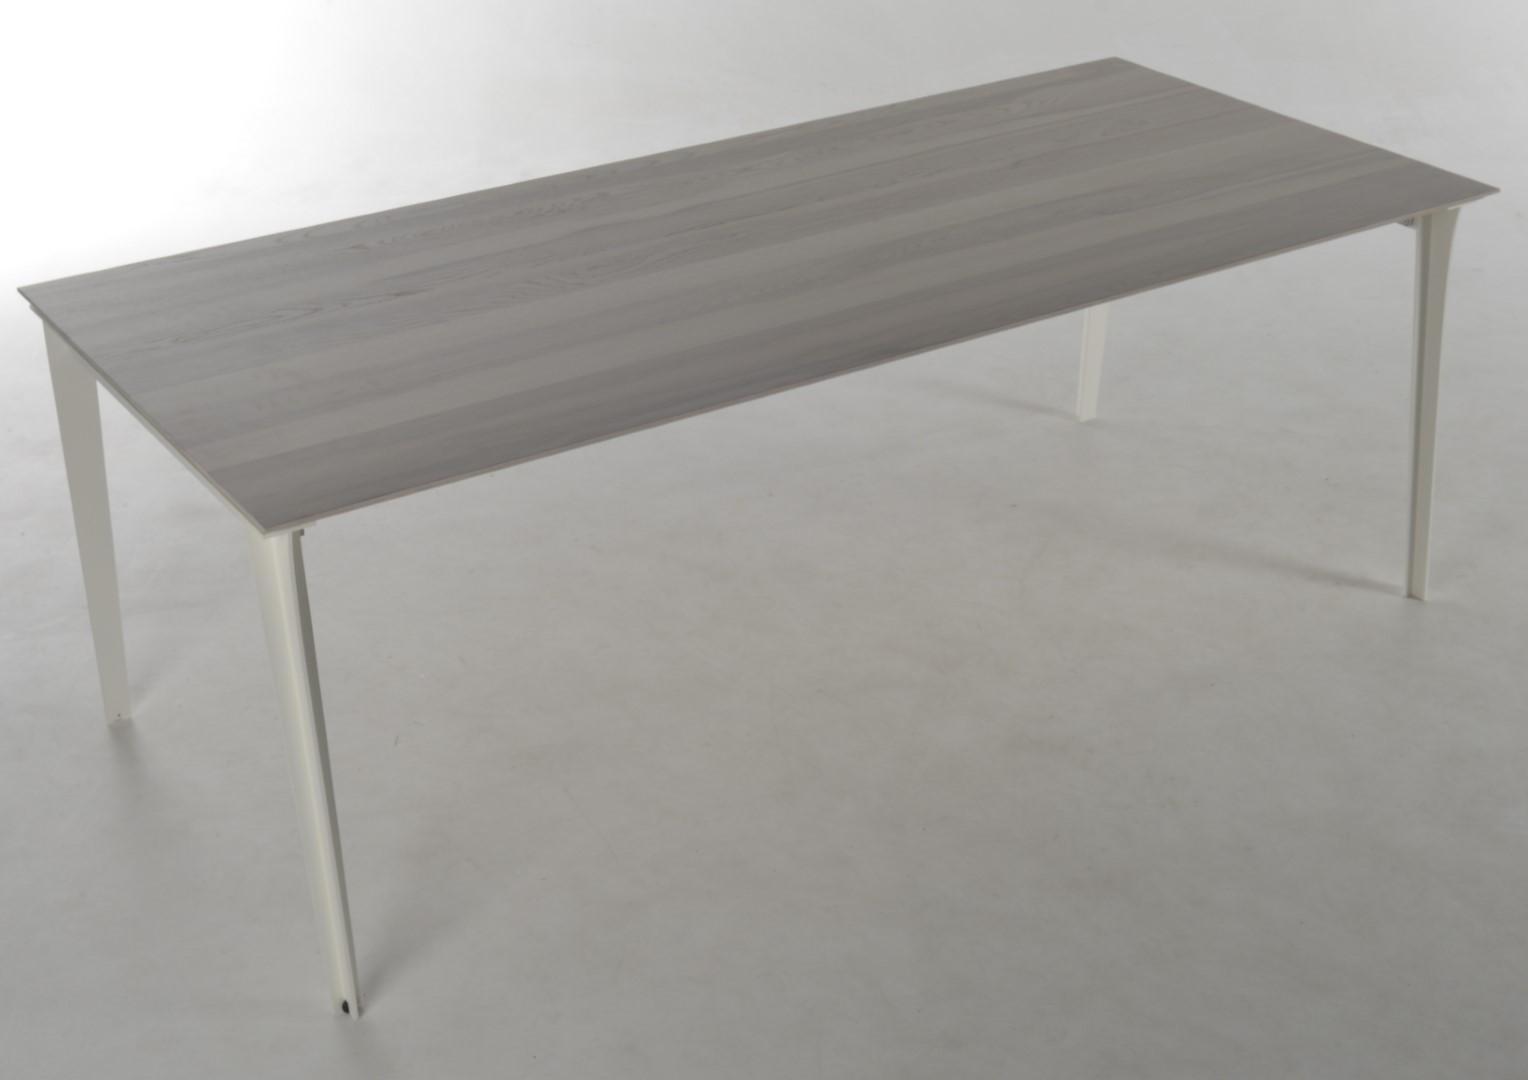 pace uitschuiftafel bert plantagie outlet. Black Bedroom Furniture Sets. Home Design Ideas